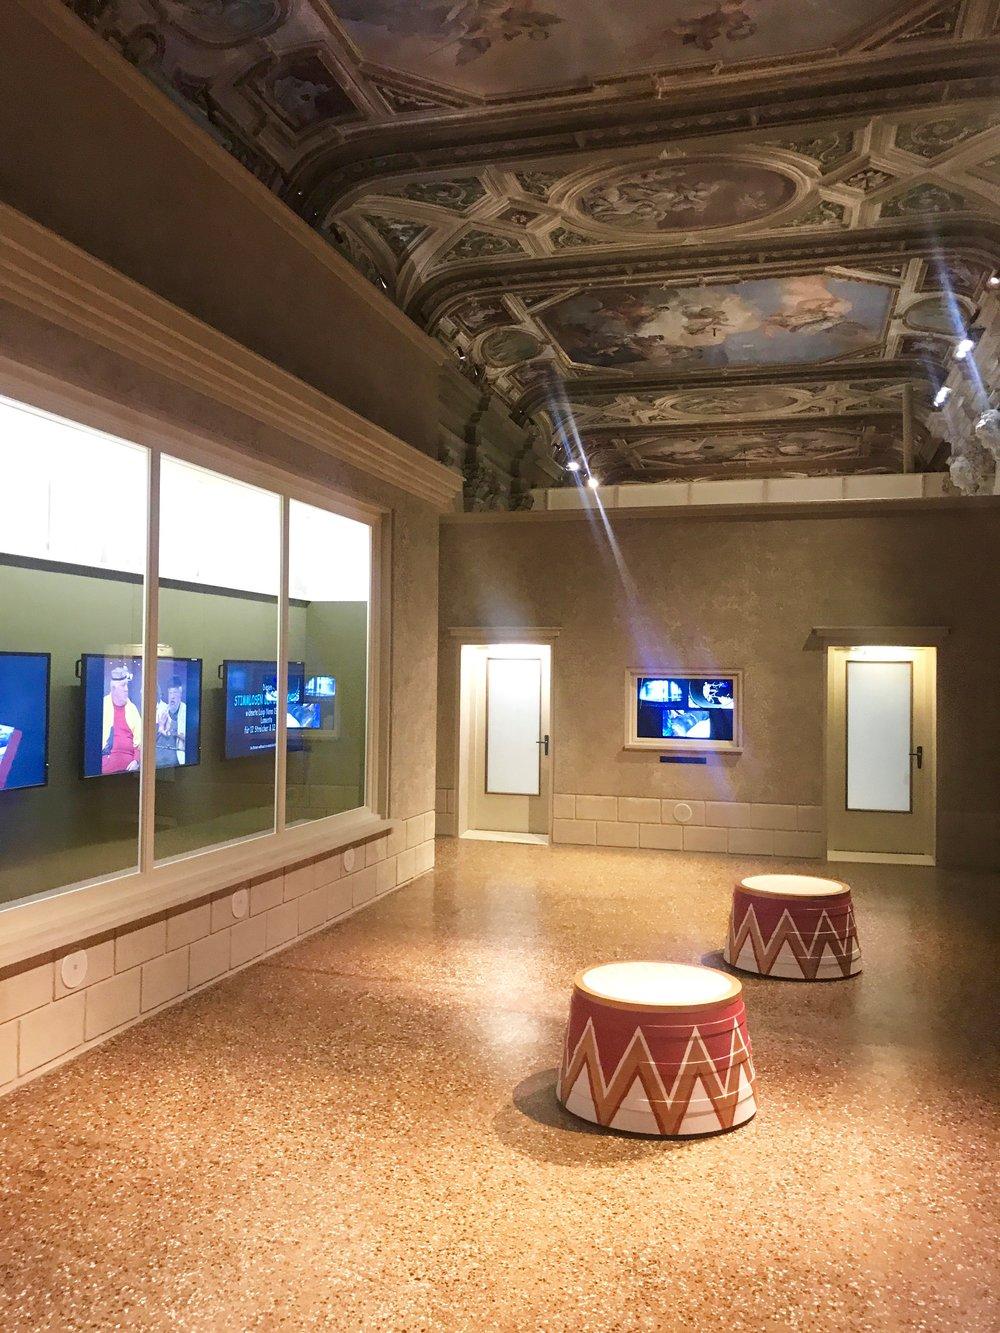 Maria-Brito_Venice-Biennale-54.jpg